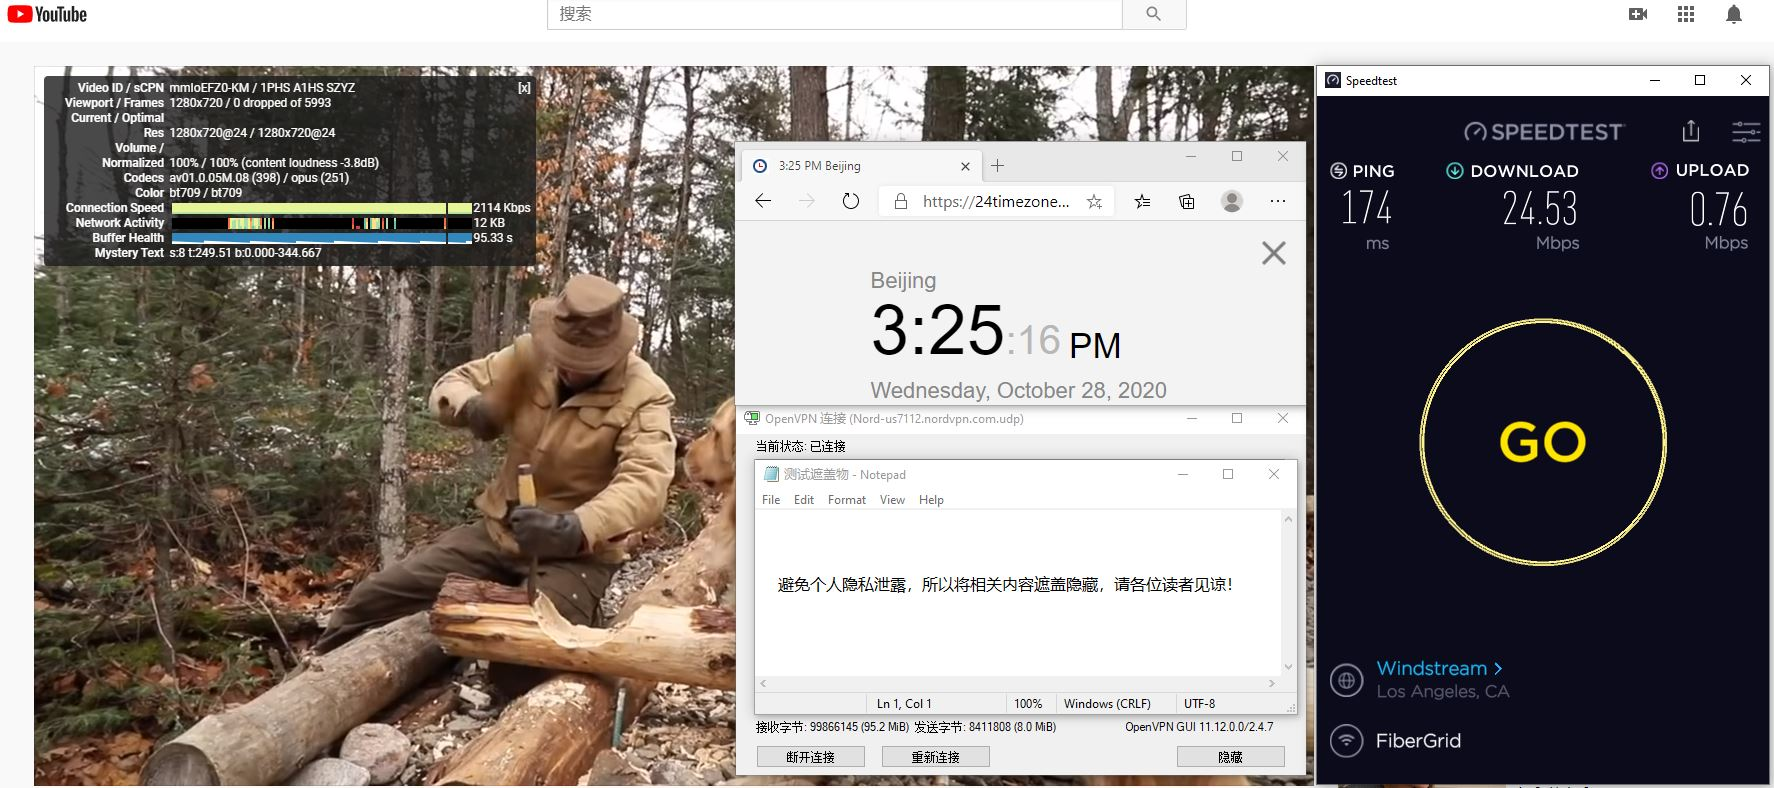 Windows10 NordVPN OpenVPN Gui us7112 服务器 中国VPN 翻墙 科学上网 测试 - 20201028